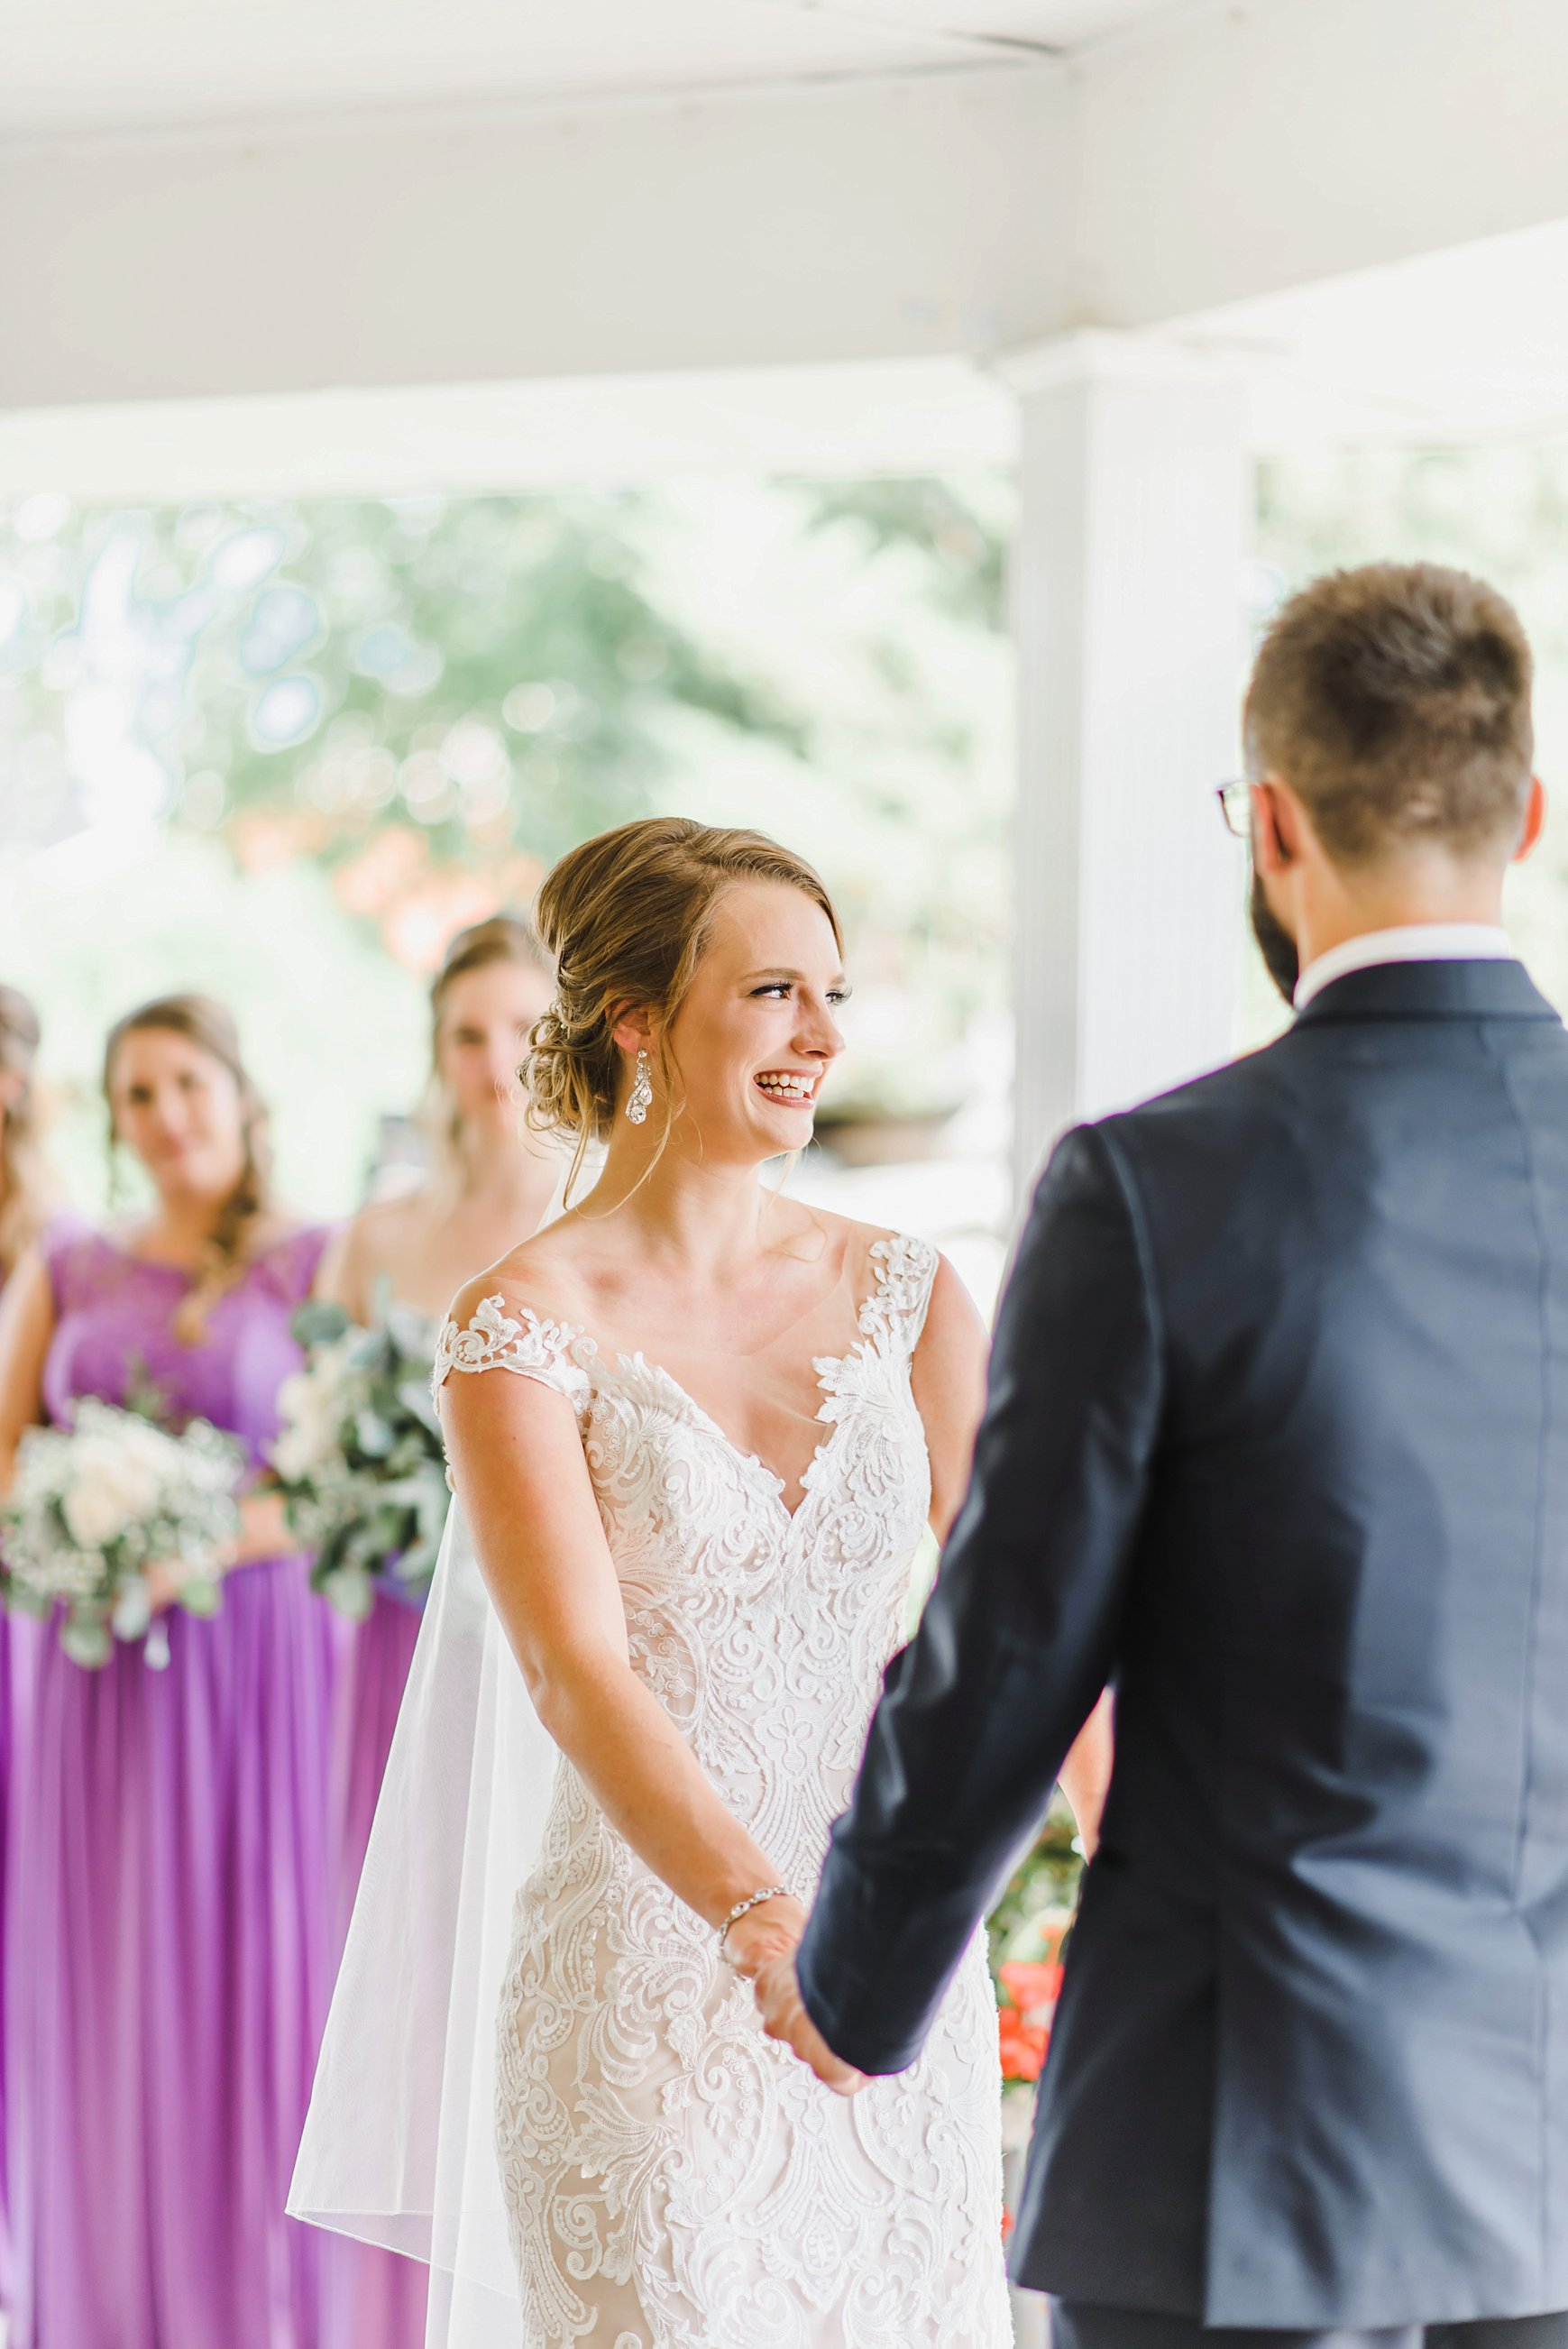 light airy indie fine art ottawa wedding photographer | Ali and Batoul Photography_1274.jpg